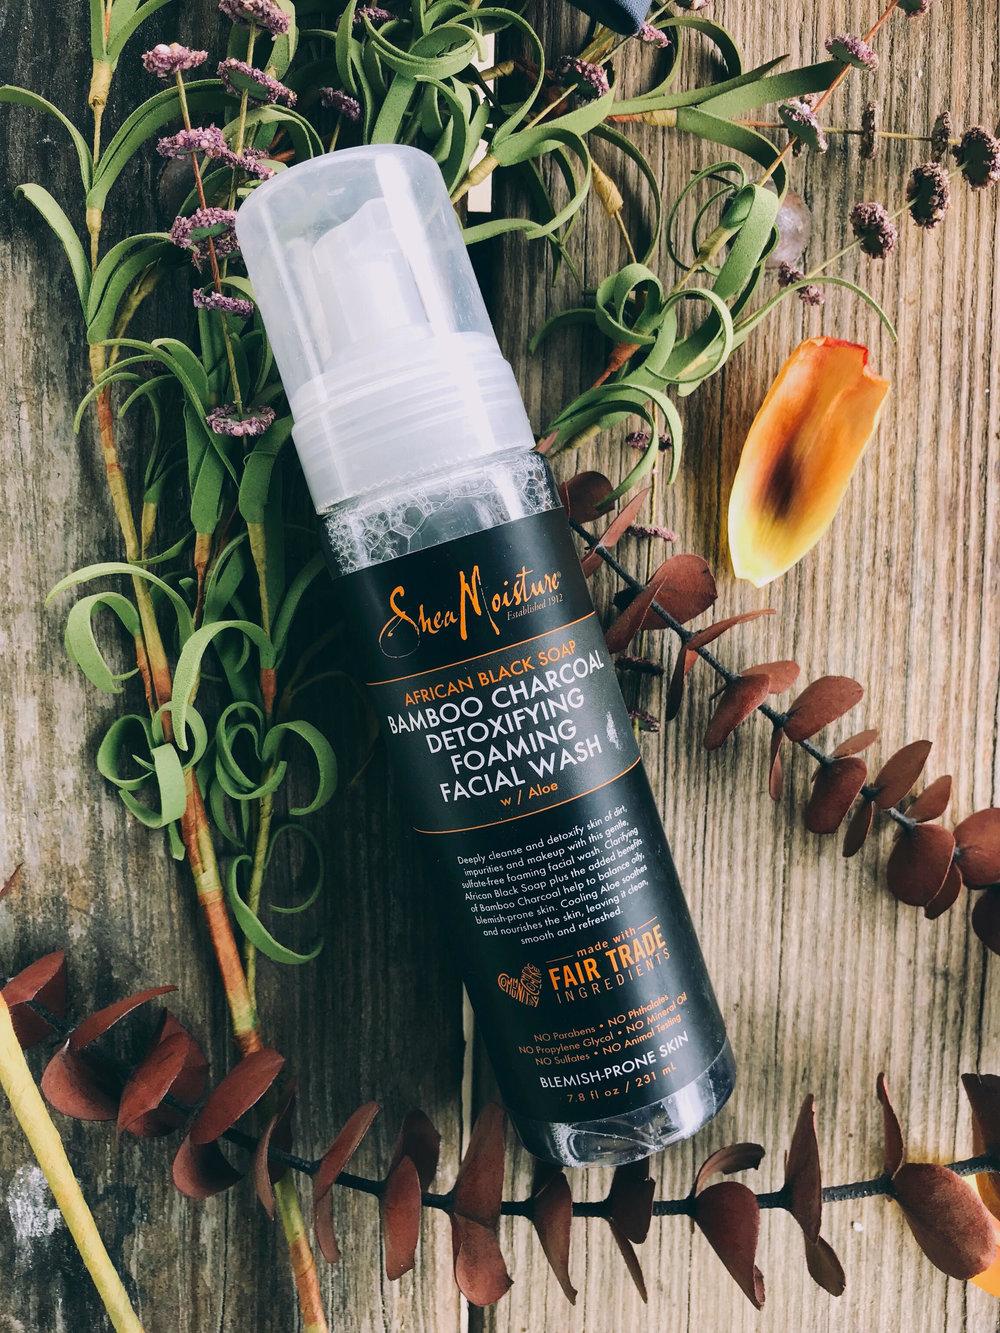 Bamboo Charcoal - Detoxifying Foaming Facial Wash with Aloe